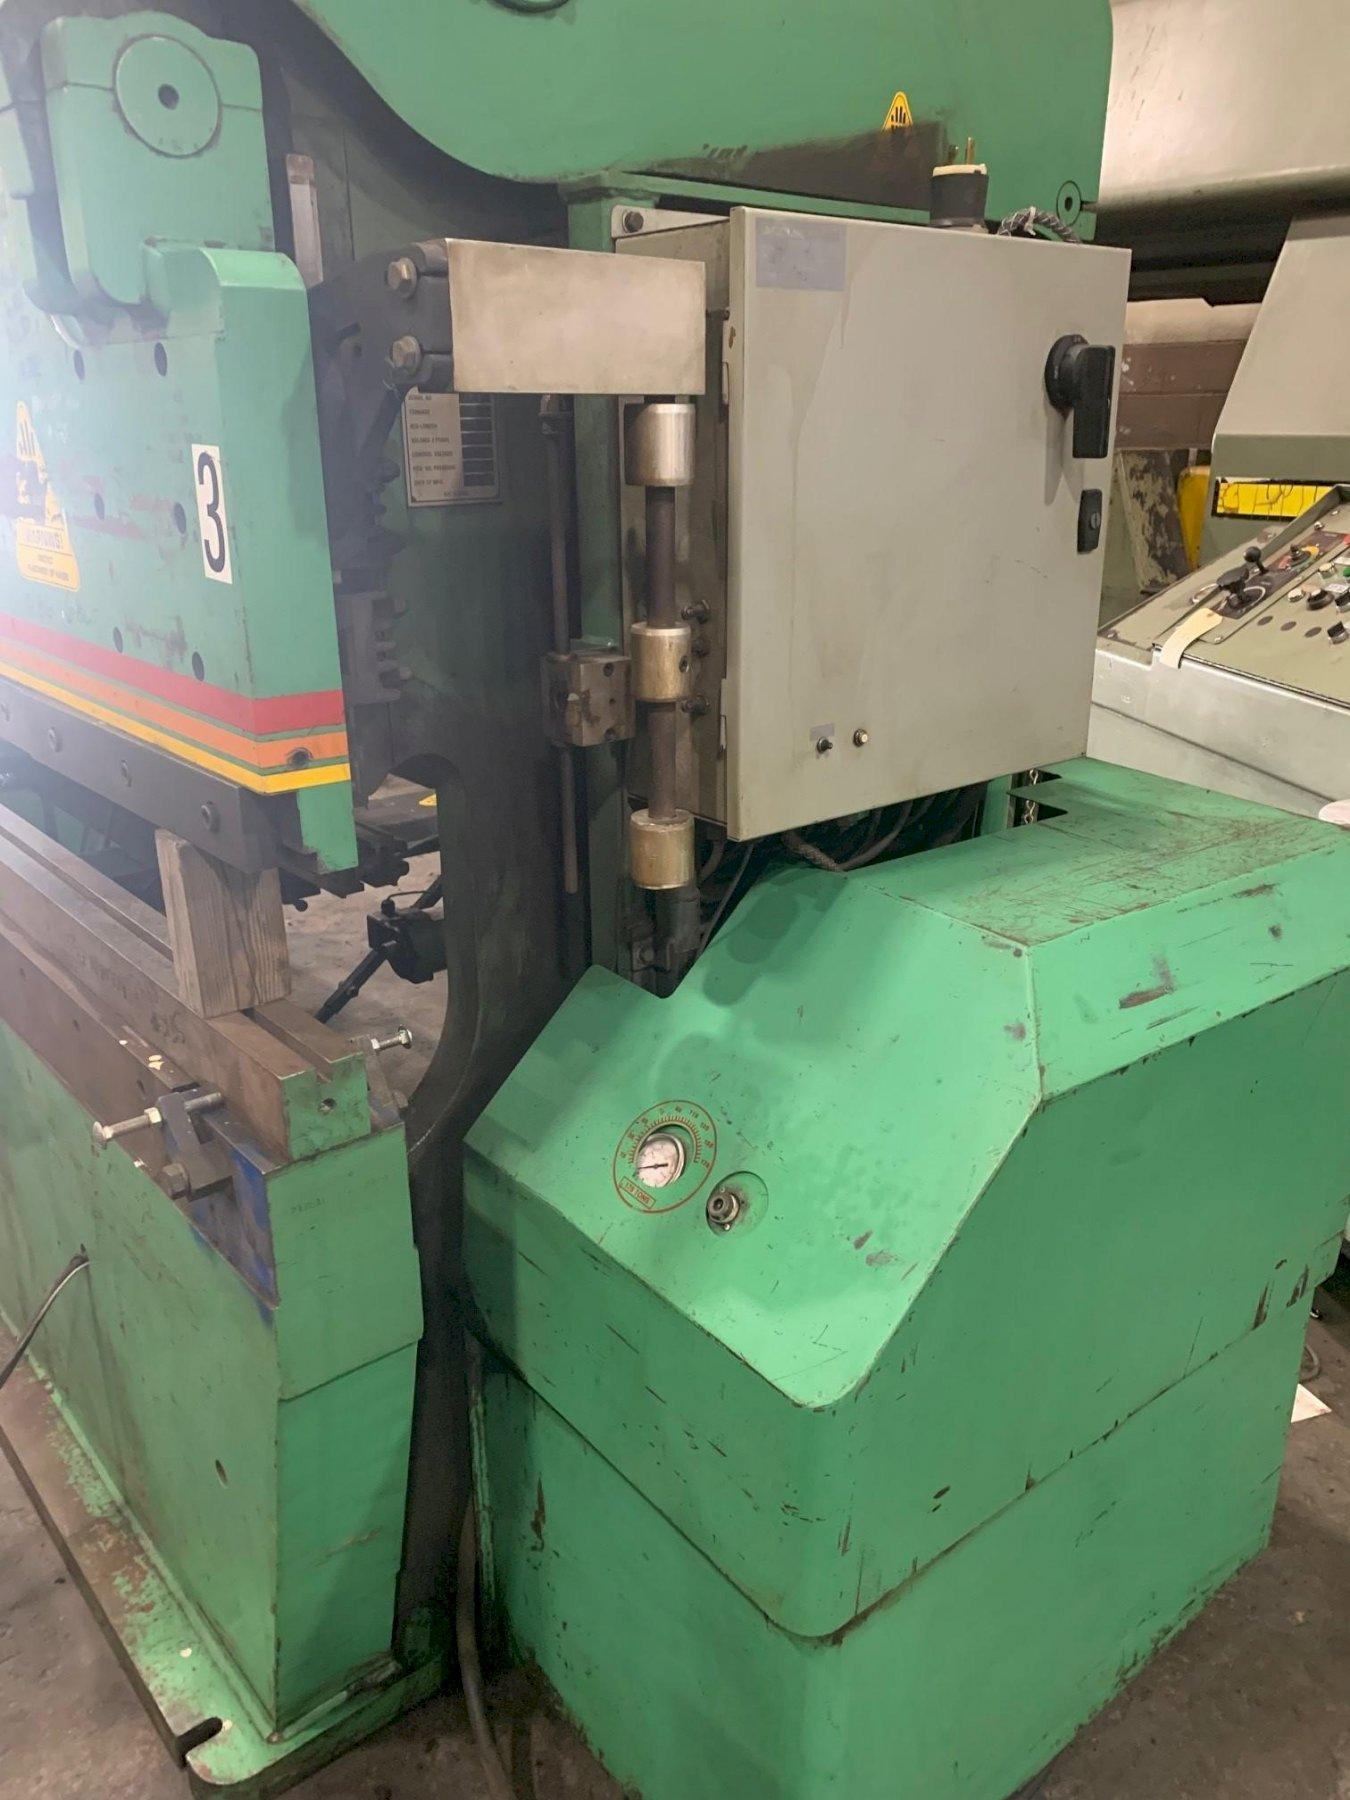 USED ACCURPRESS 175 TON X 10' HYDRAULIC CNC PRESS BRAKE, MODEL 717510, Stock# 10875, Year: 1994